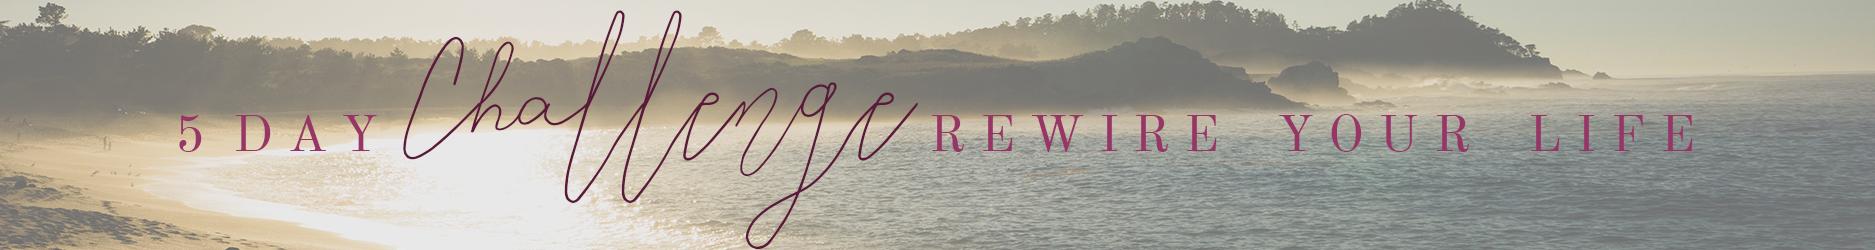 Soul Awakening - 5 Day Challenge. Audrey Michel. Rewired Life.